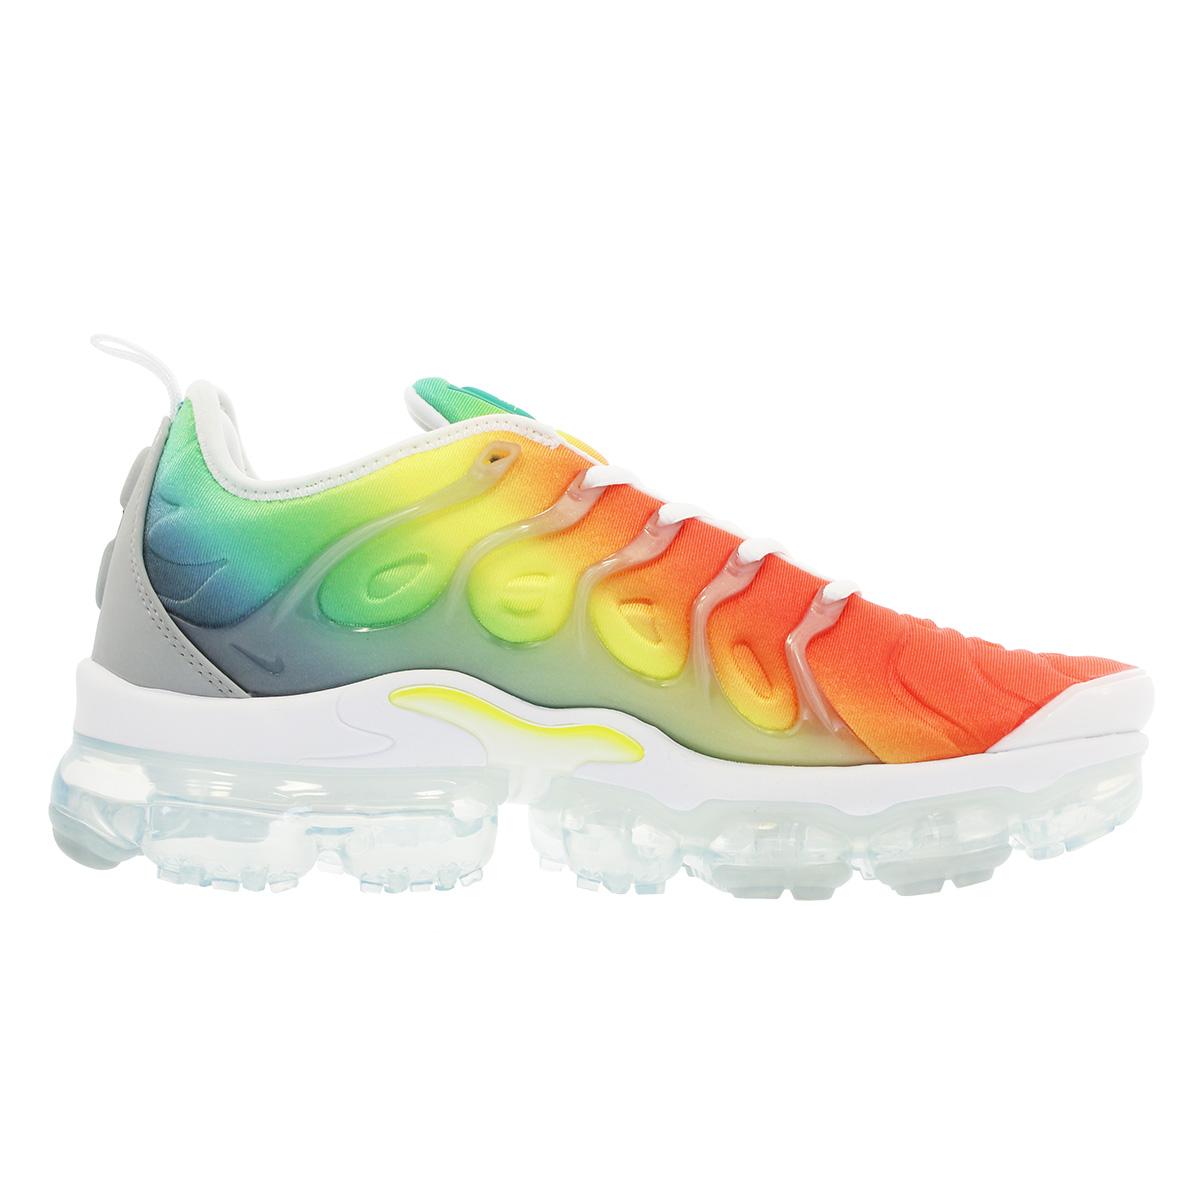 NIKE AIR VAPORMAX PLUS Nike vapor max plus WHITE/NEPTUNE GREEN/DYNAMIC  YELLOW 924,453-103